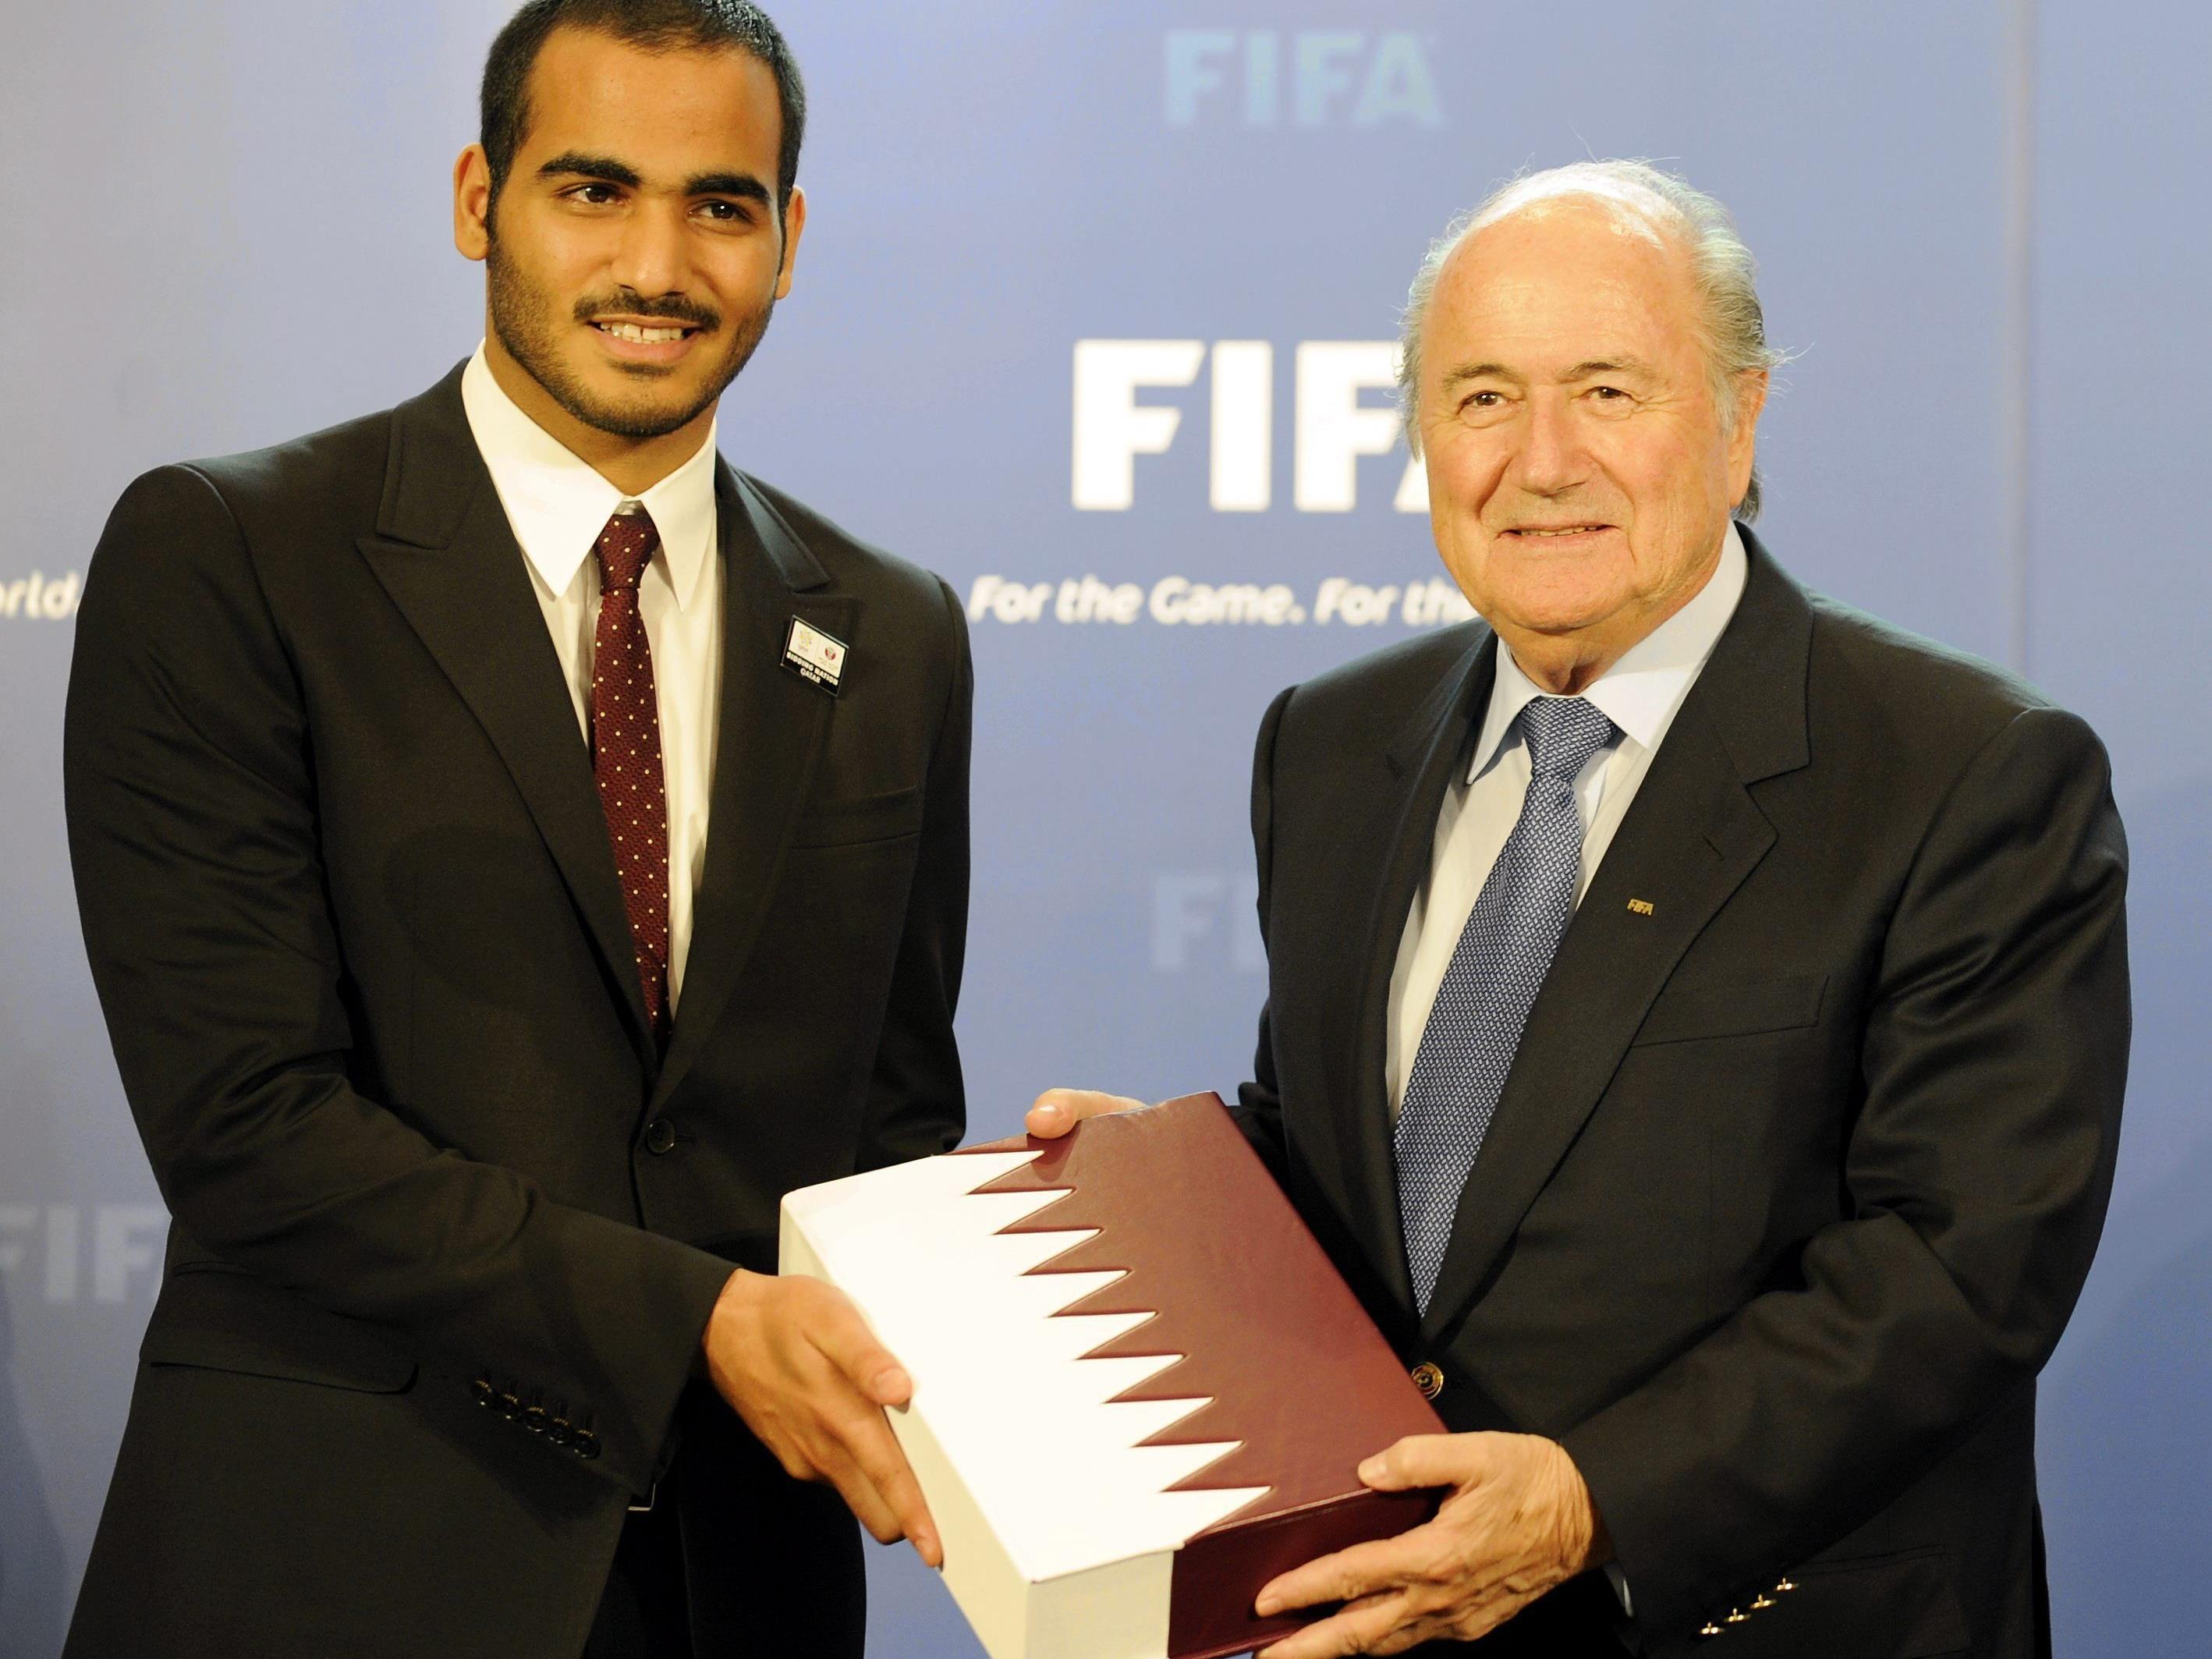 Sheik Mohammed bin Hamad bin Khlifa Al Thani mit Fifa-Präsident Sepp Blatter.